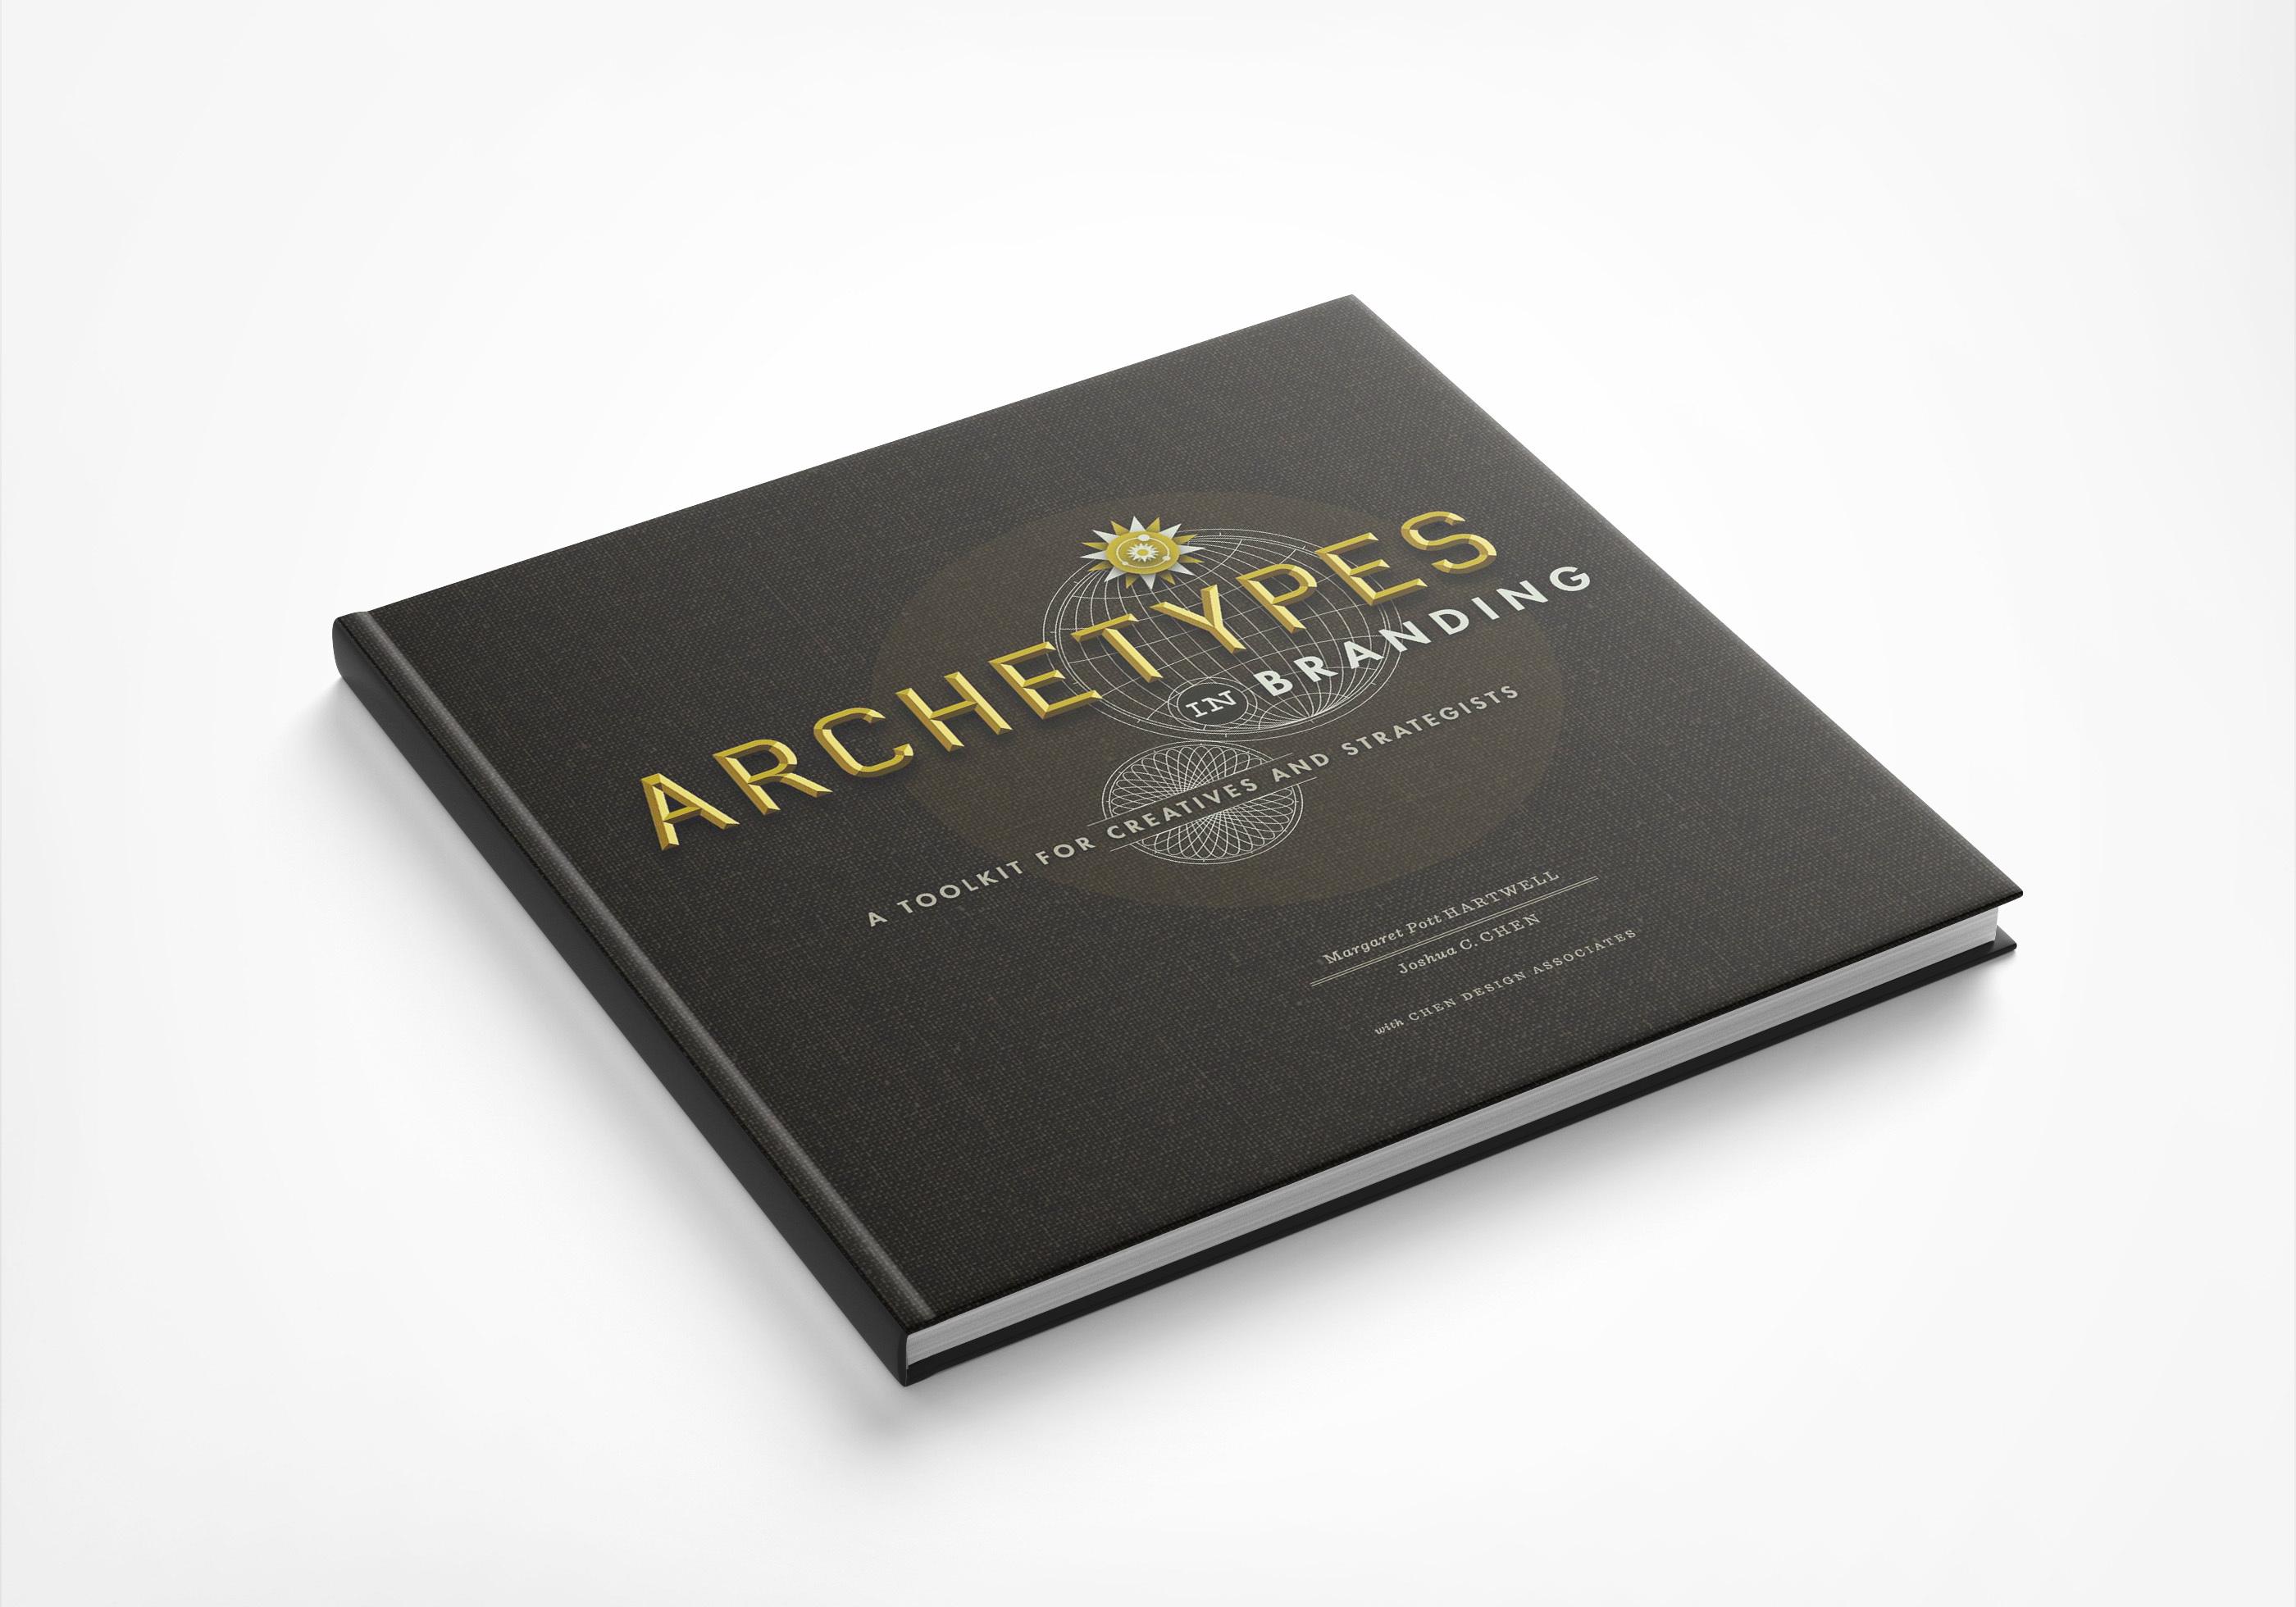 Archetypes in Branding book